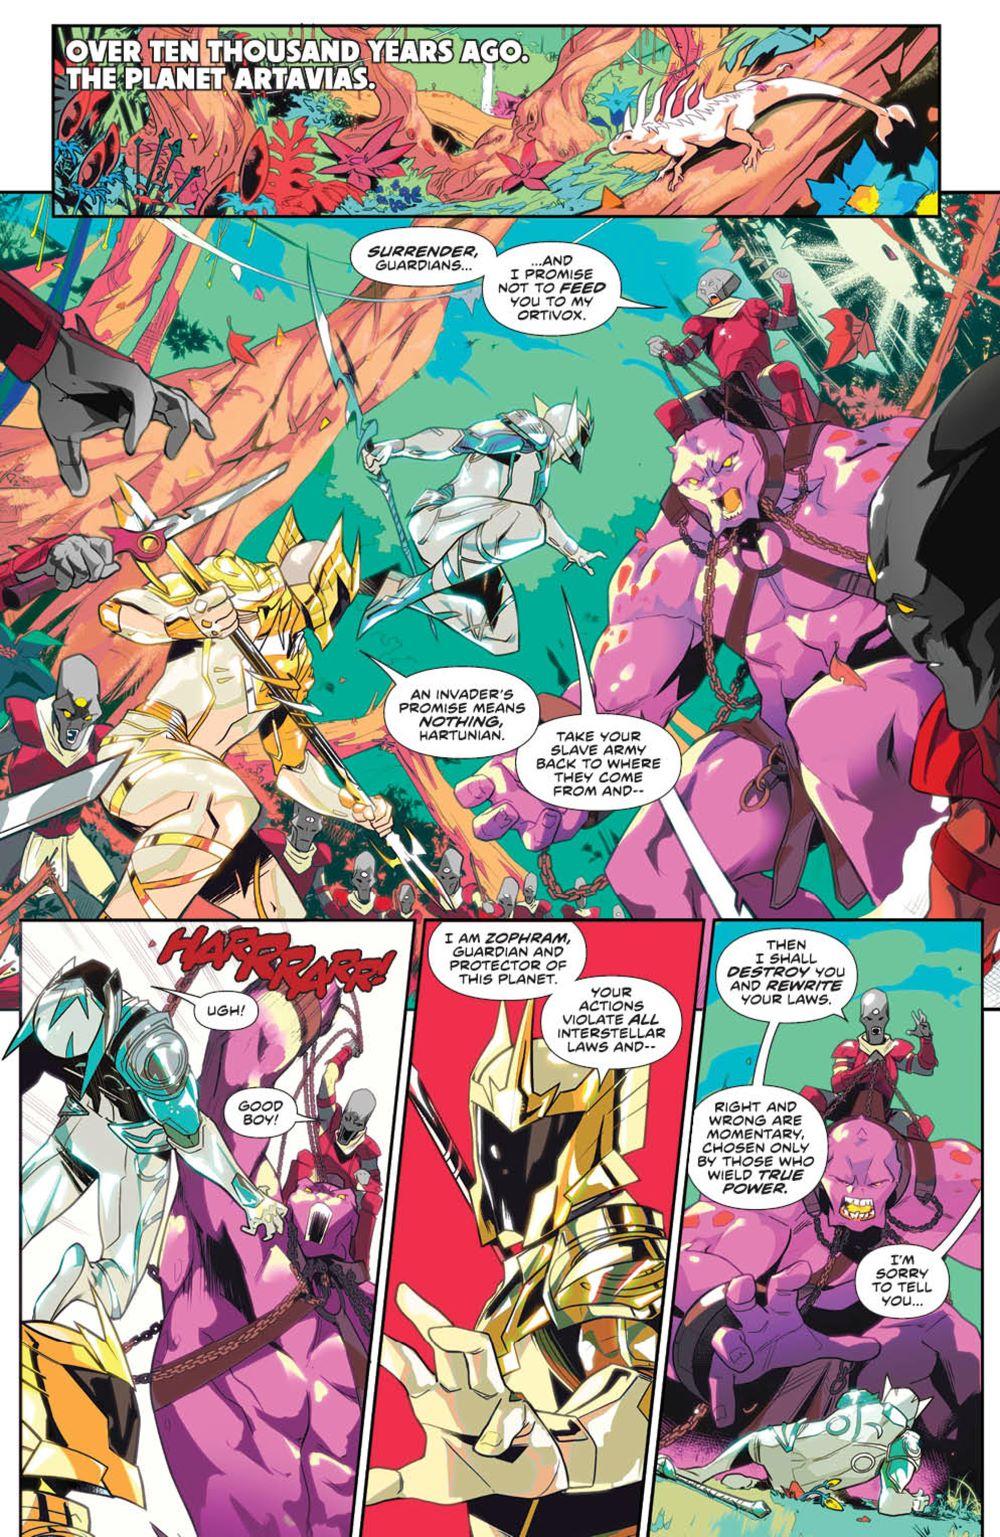 MightyMorphin_v1_SC_PRESS_7 ComicList Previews: MIGHTY MORPHIN VOLUME 1 TP